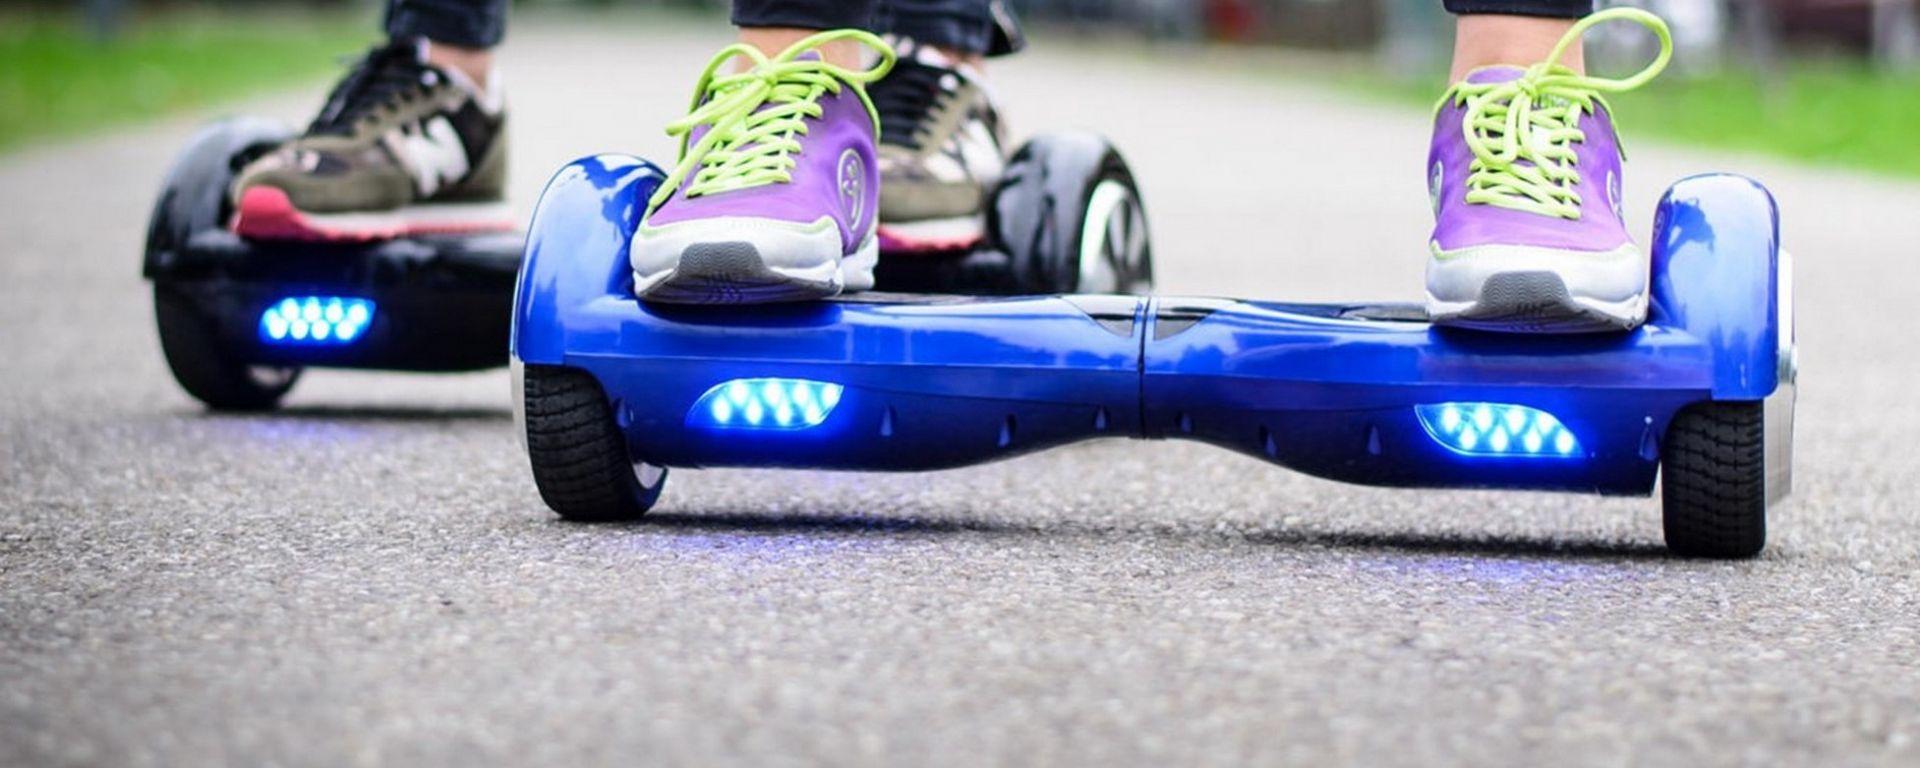 Hoverboard, rischio multa se si circola sul marciapiede